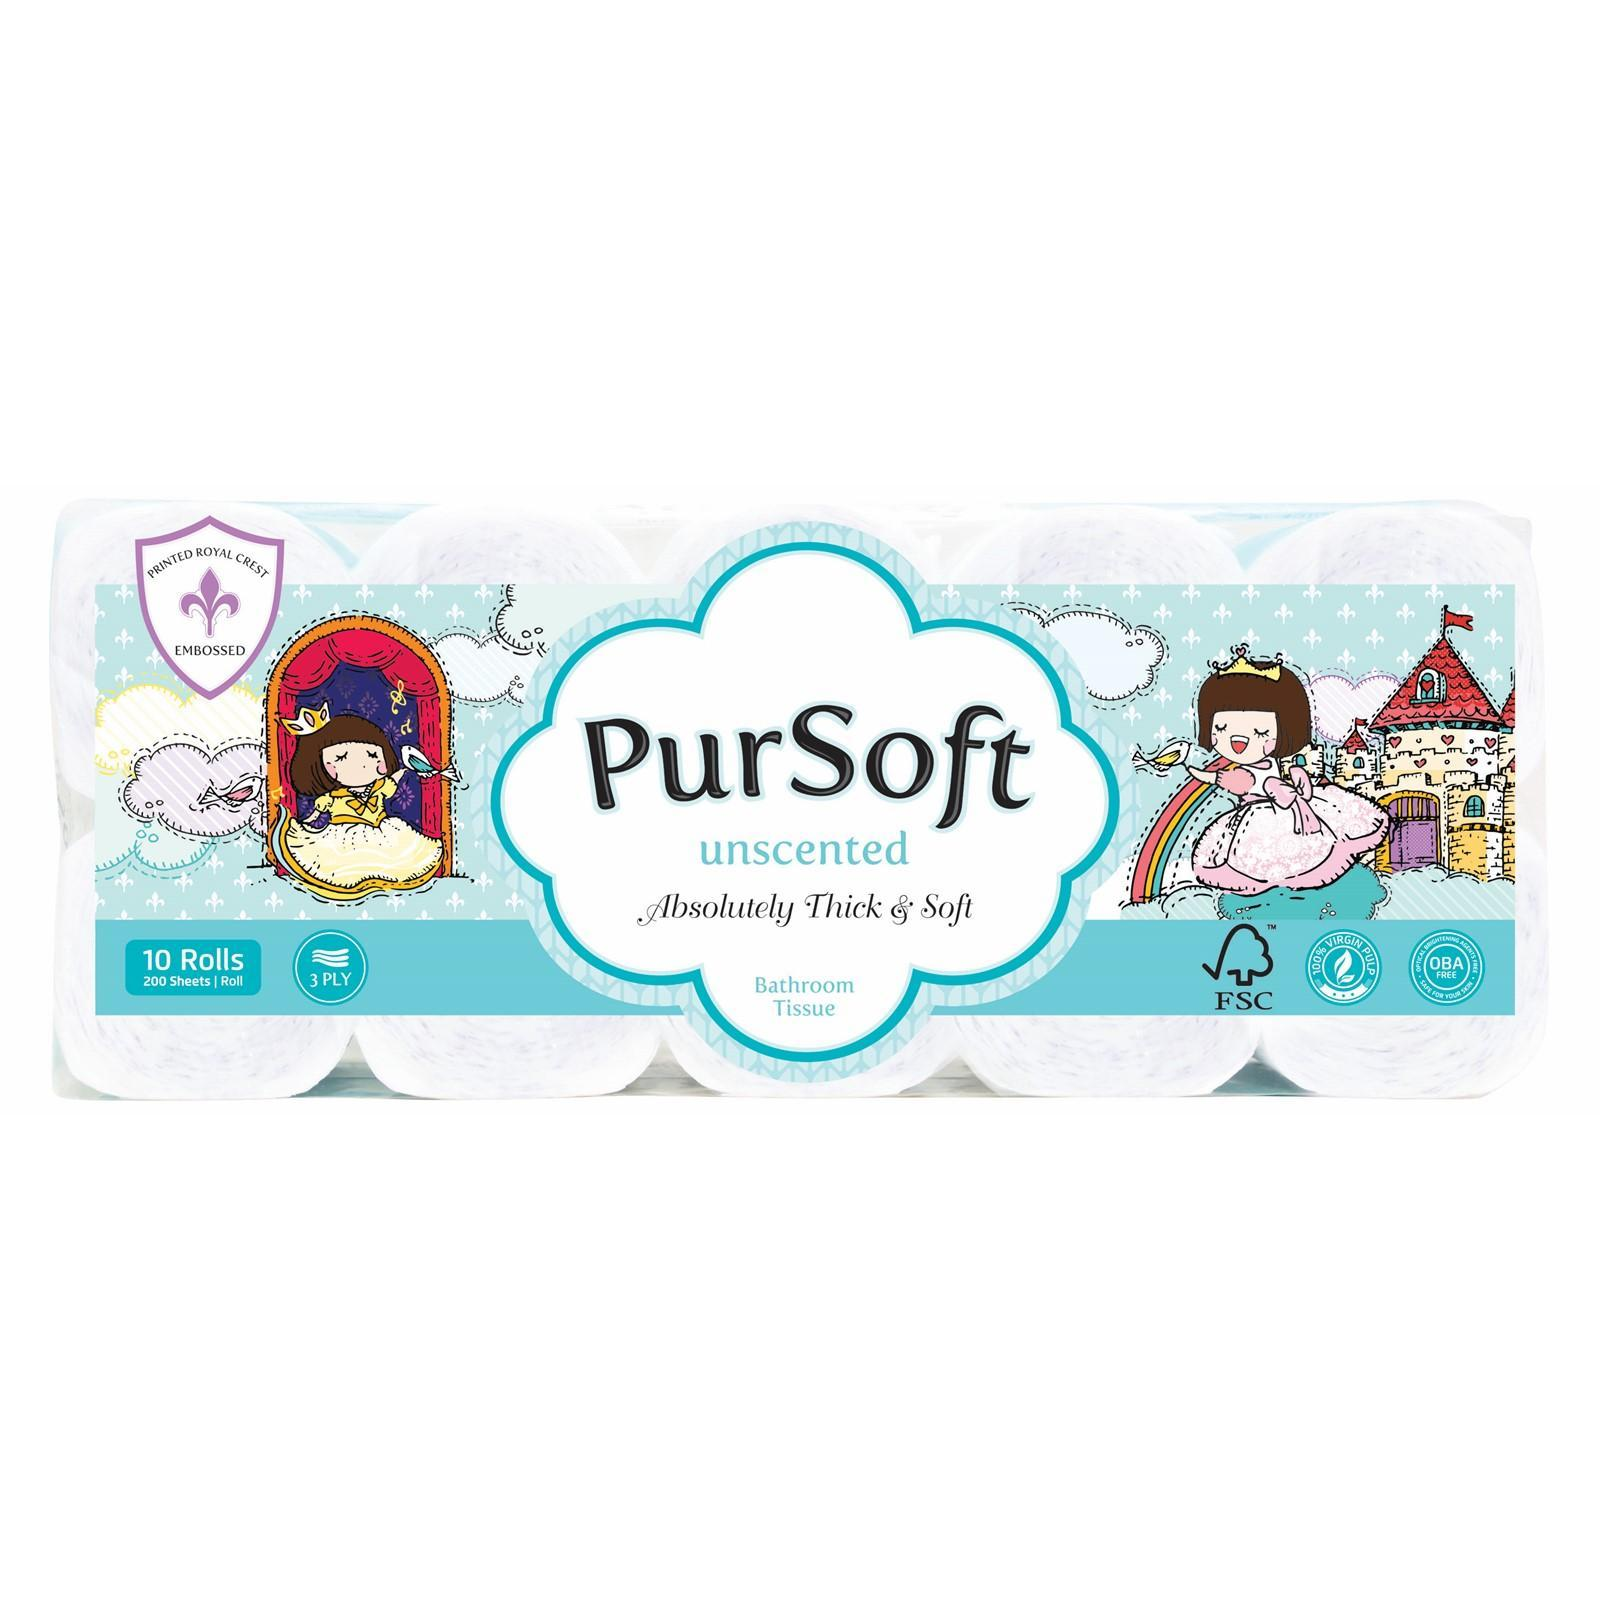 PurSoft Chocolate Rain Royal Embossed 3-Ply Toilet Tissue - 10 Rolls